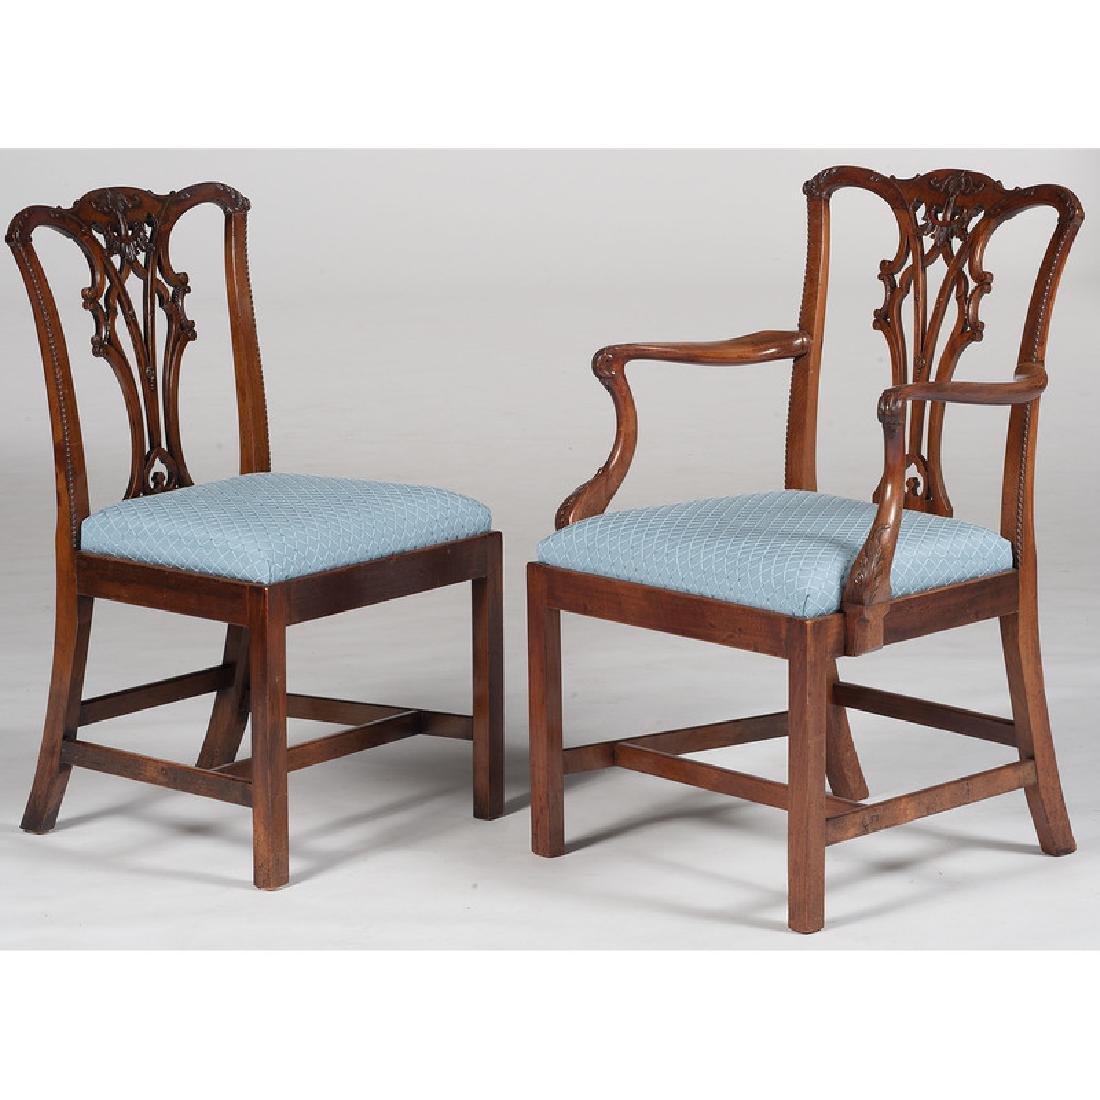 Twelve George III Chippendale Chairs - 2